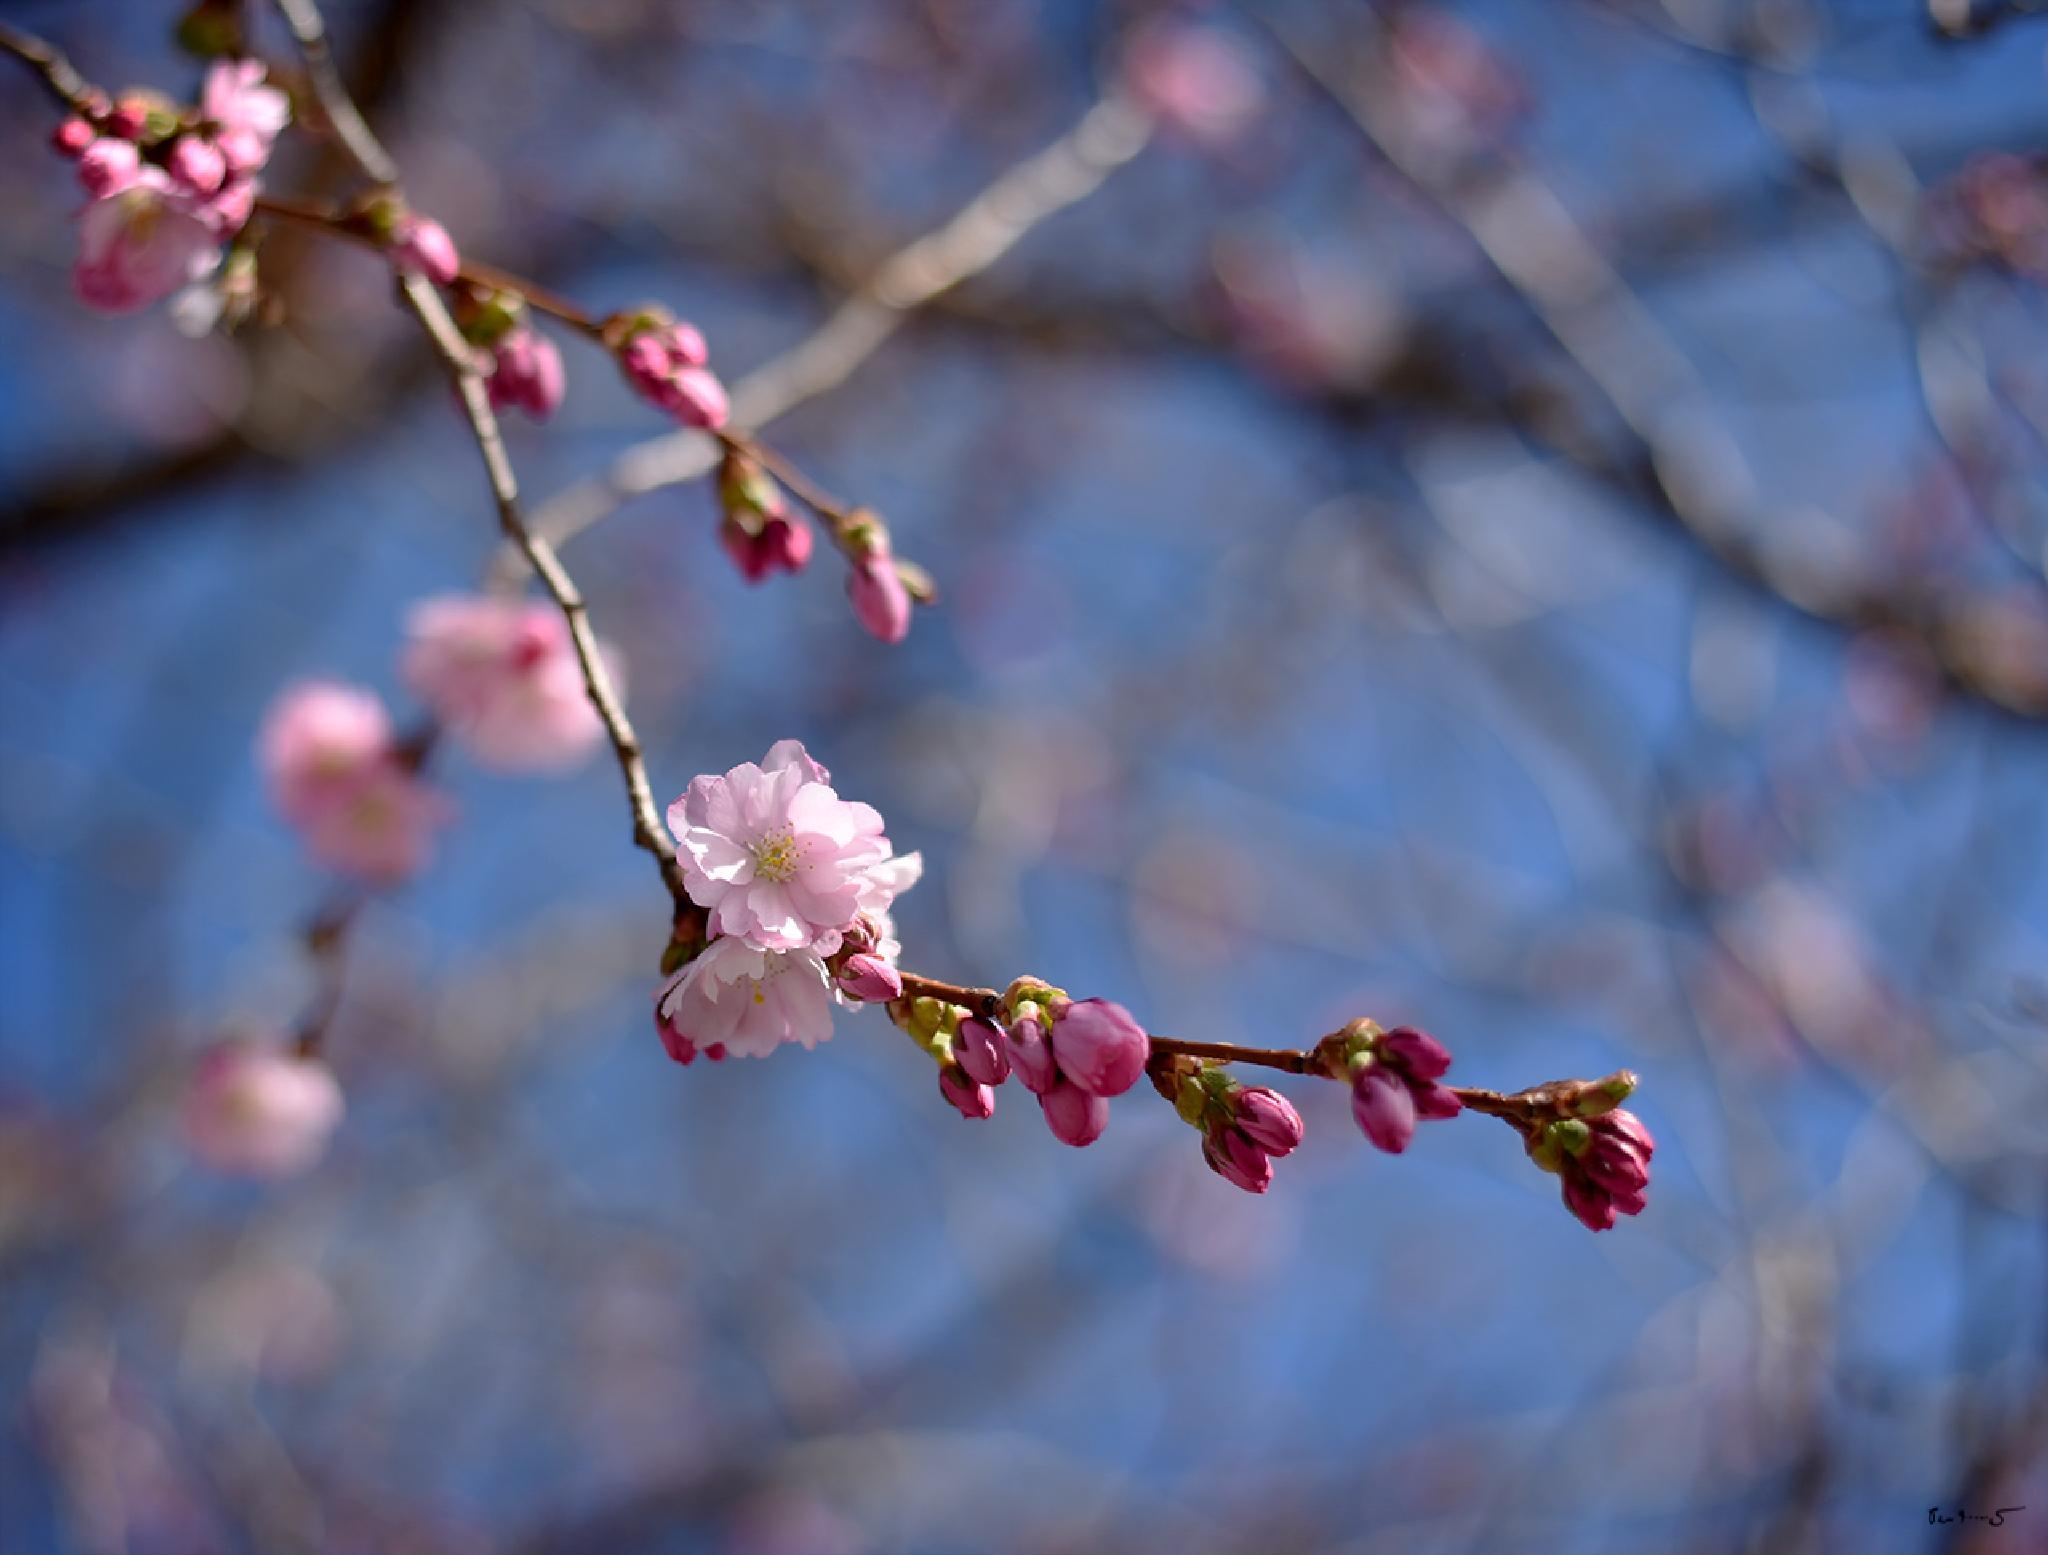 Cherry blossom in the park by Per Arnesjö